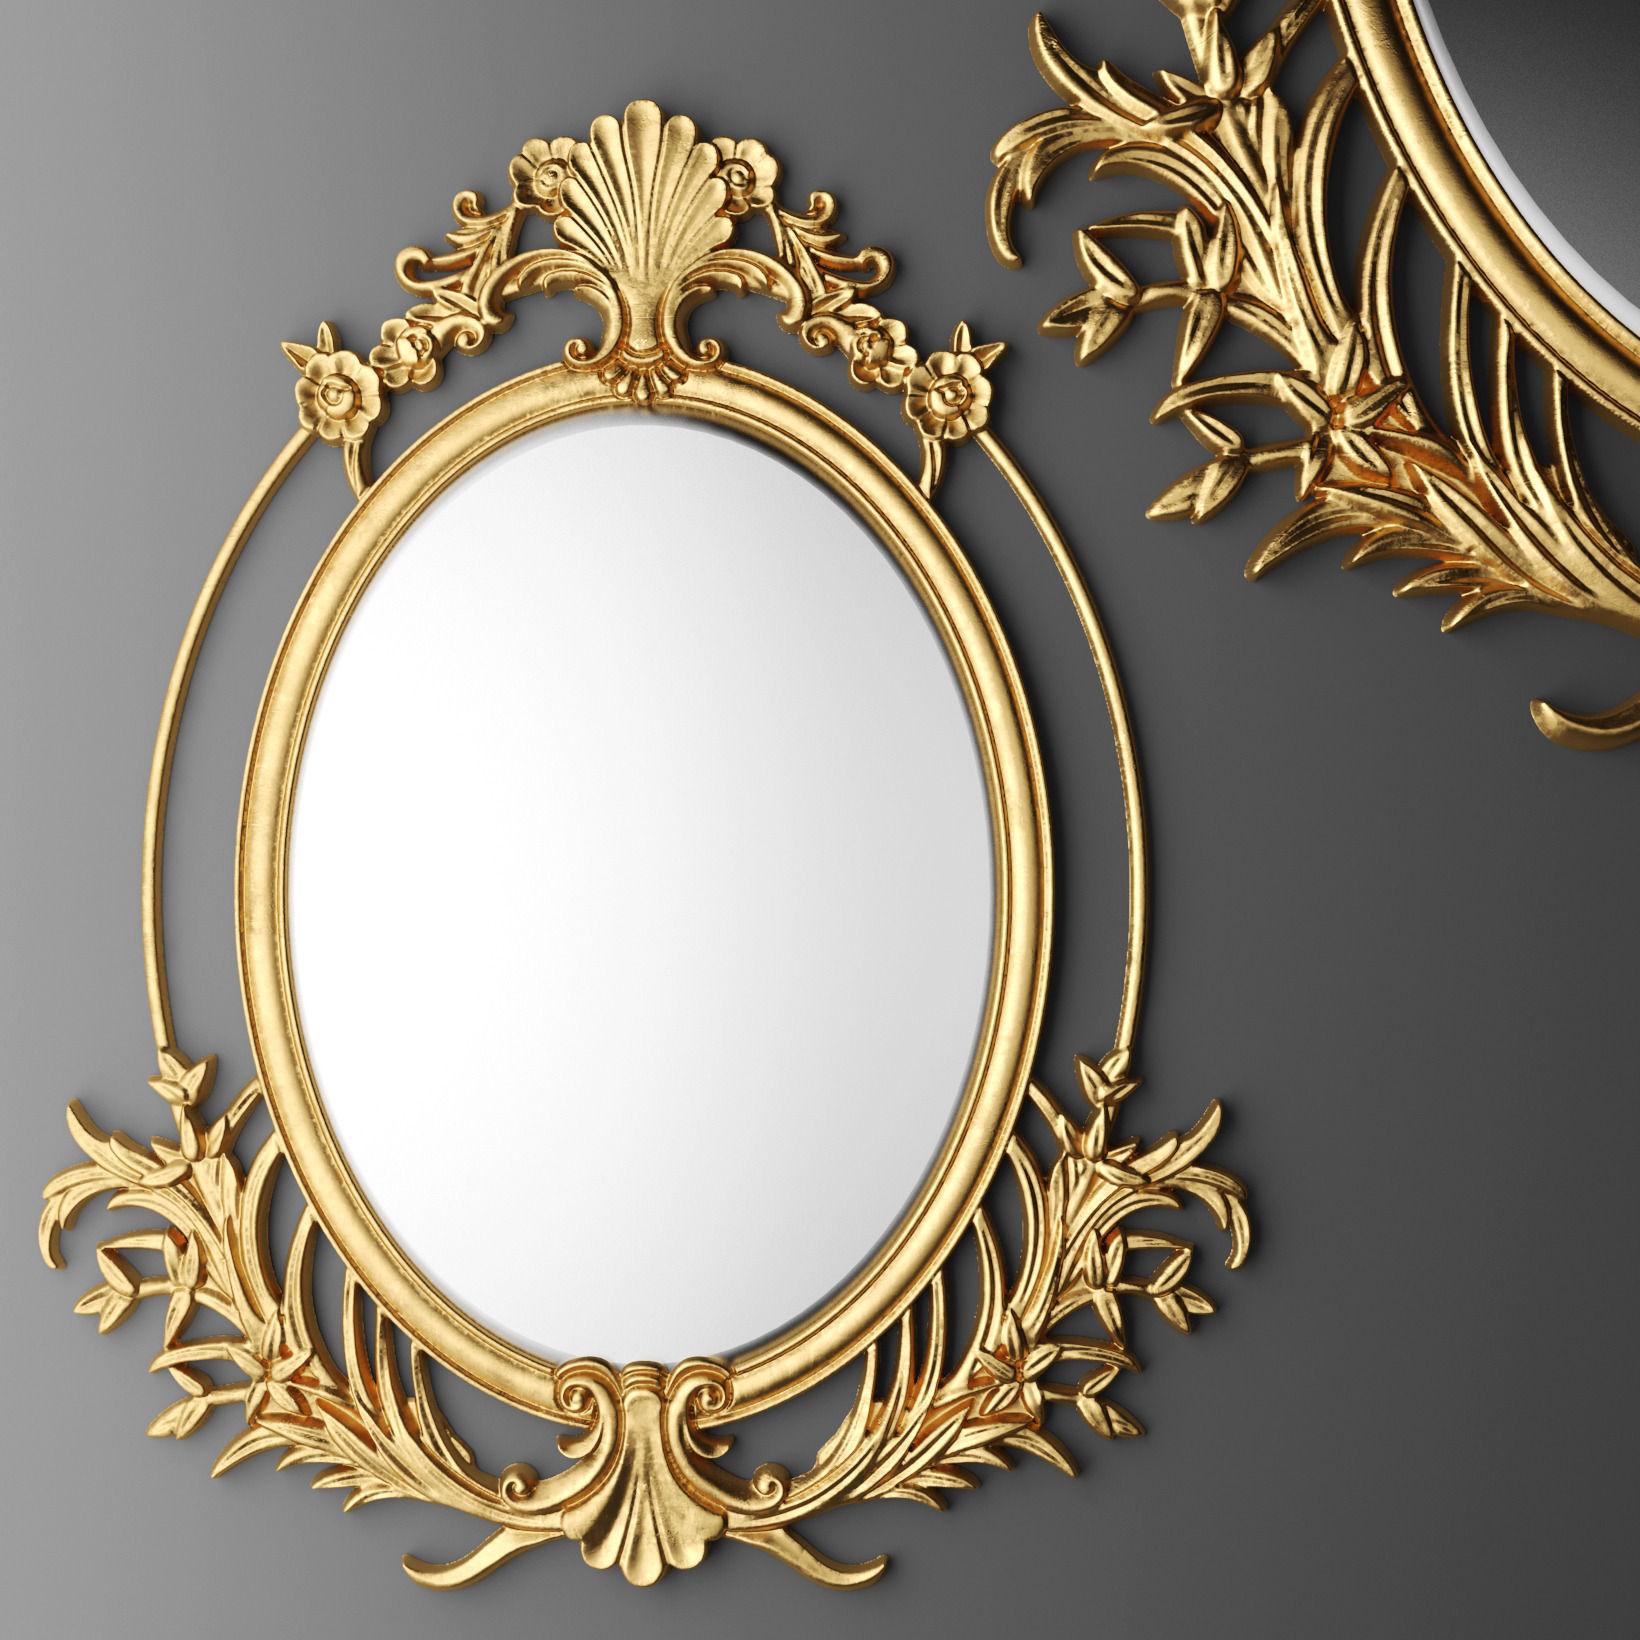 Baroque oval frame 3D | CGTrader